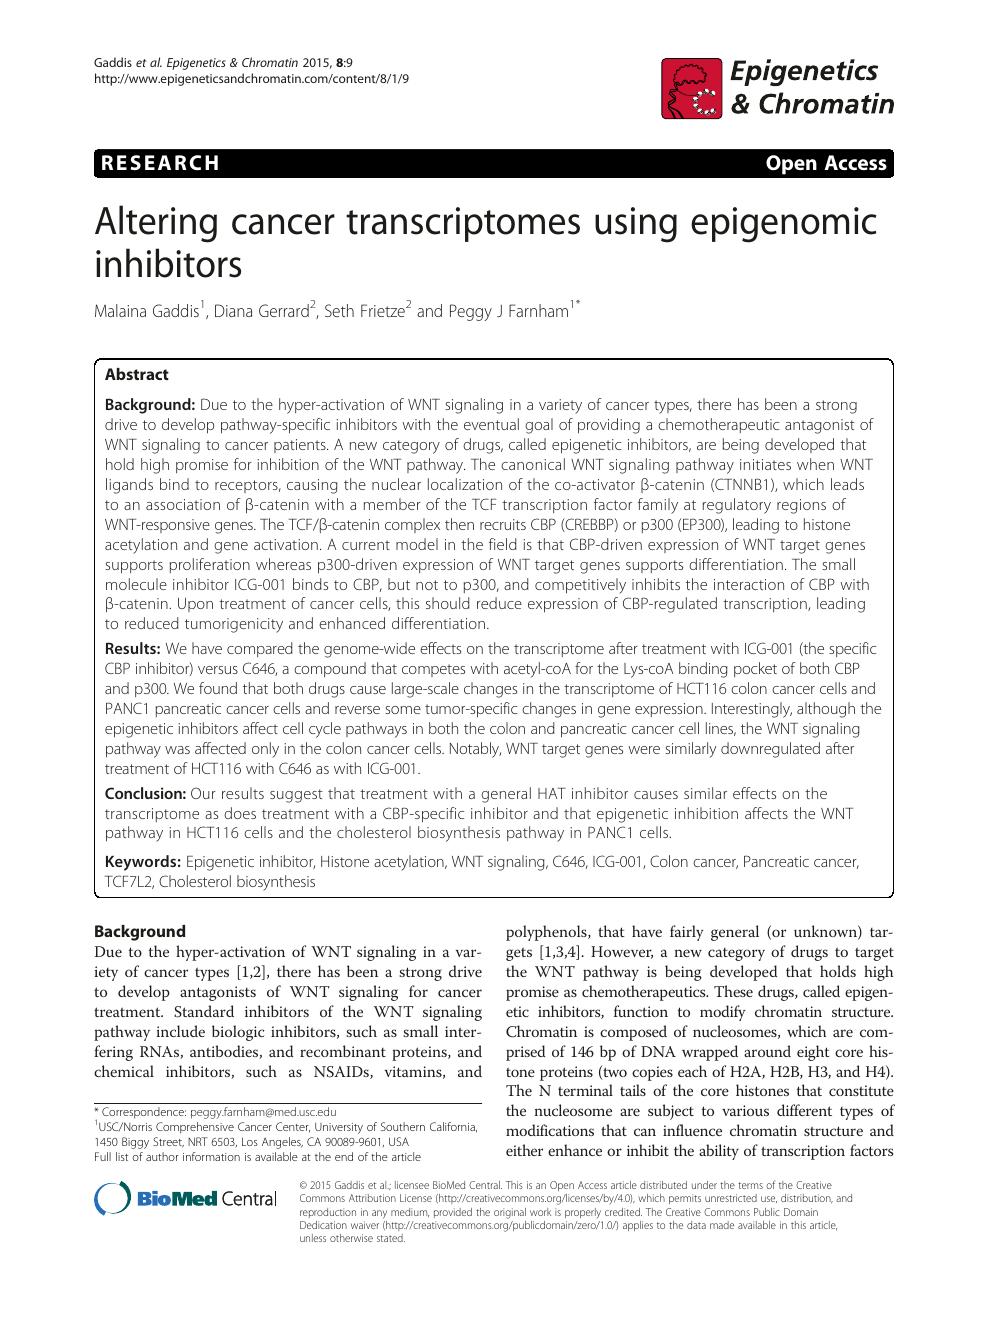 Altering cancer transcriptomes using epigenomic inhibitors